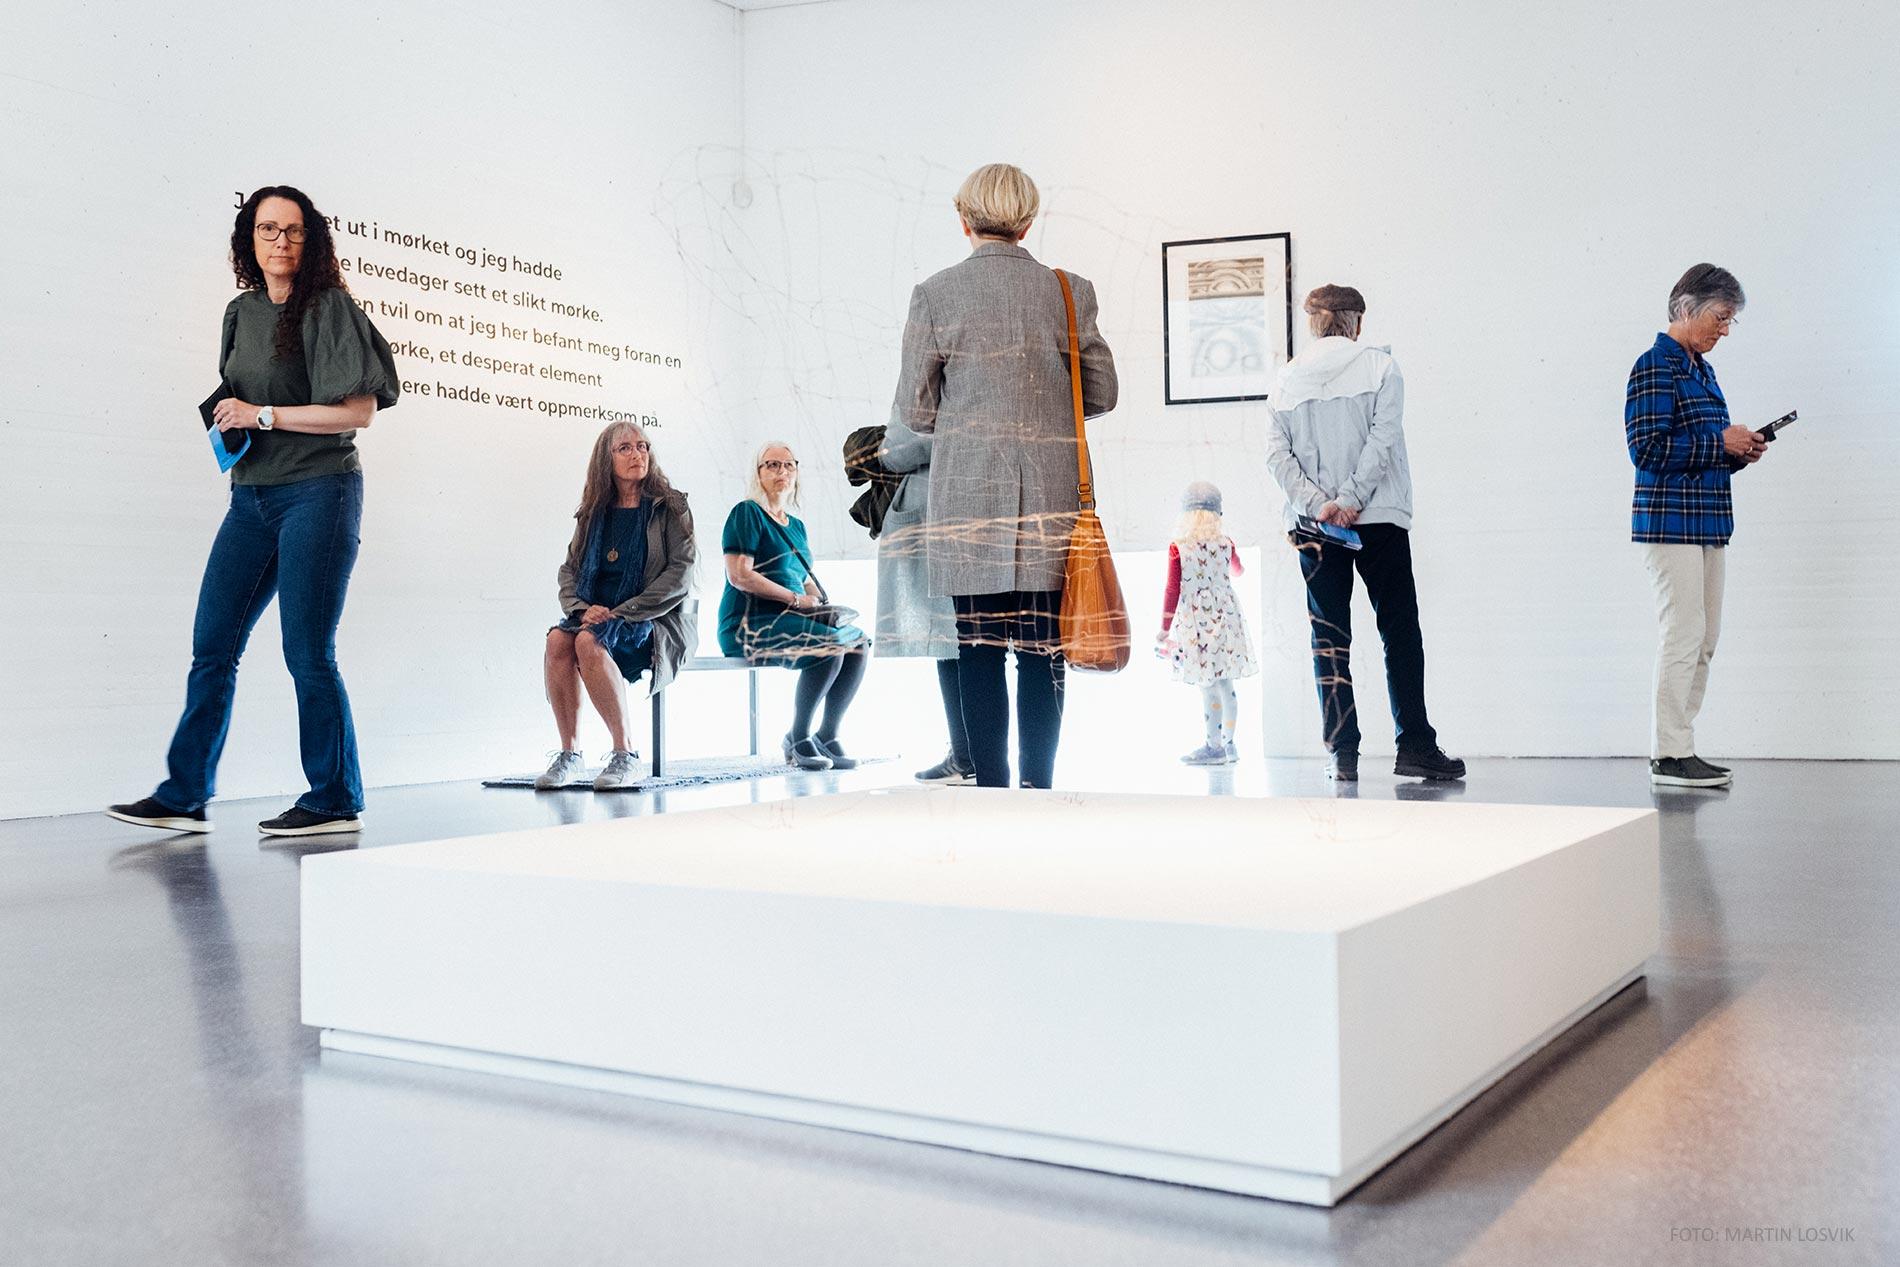 folk i utstilling - Hamsunsenter